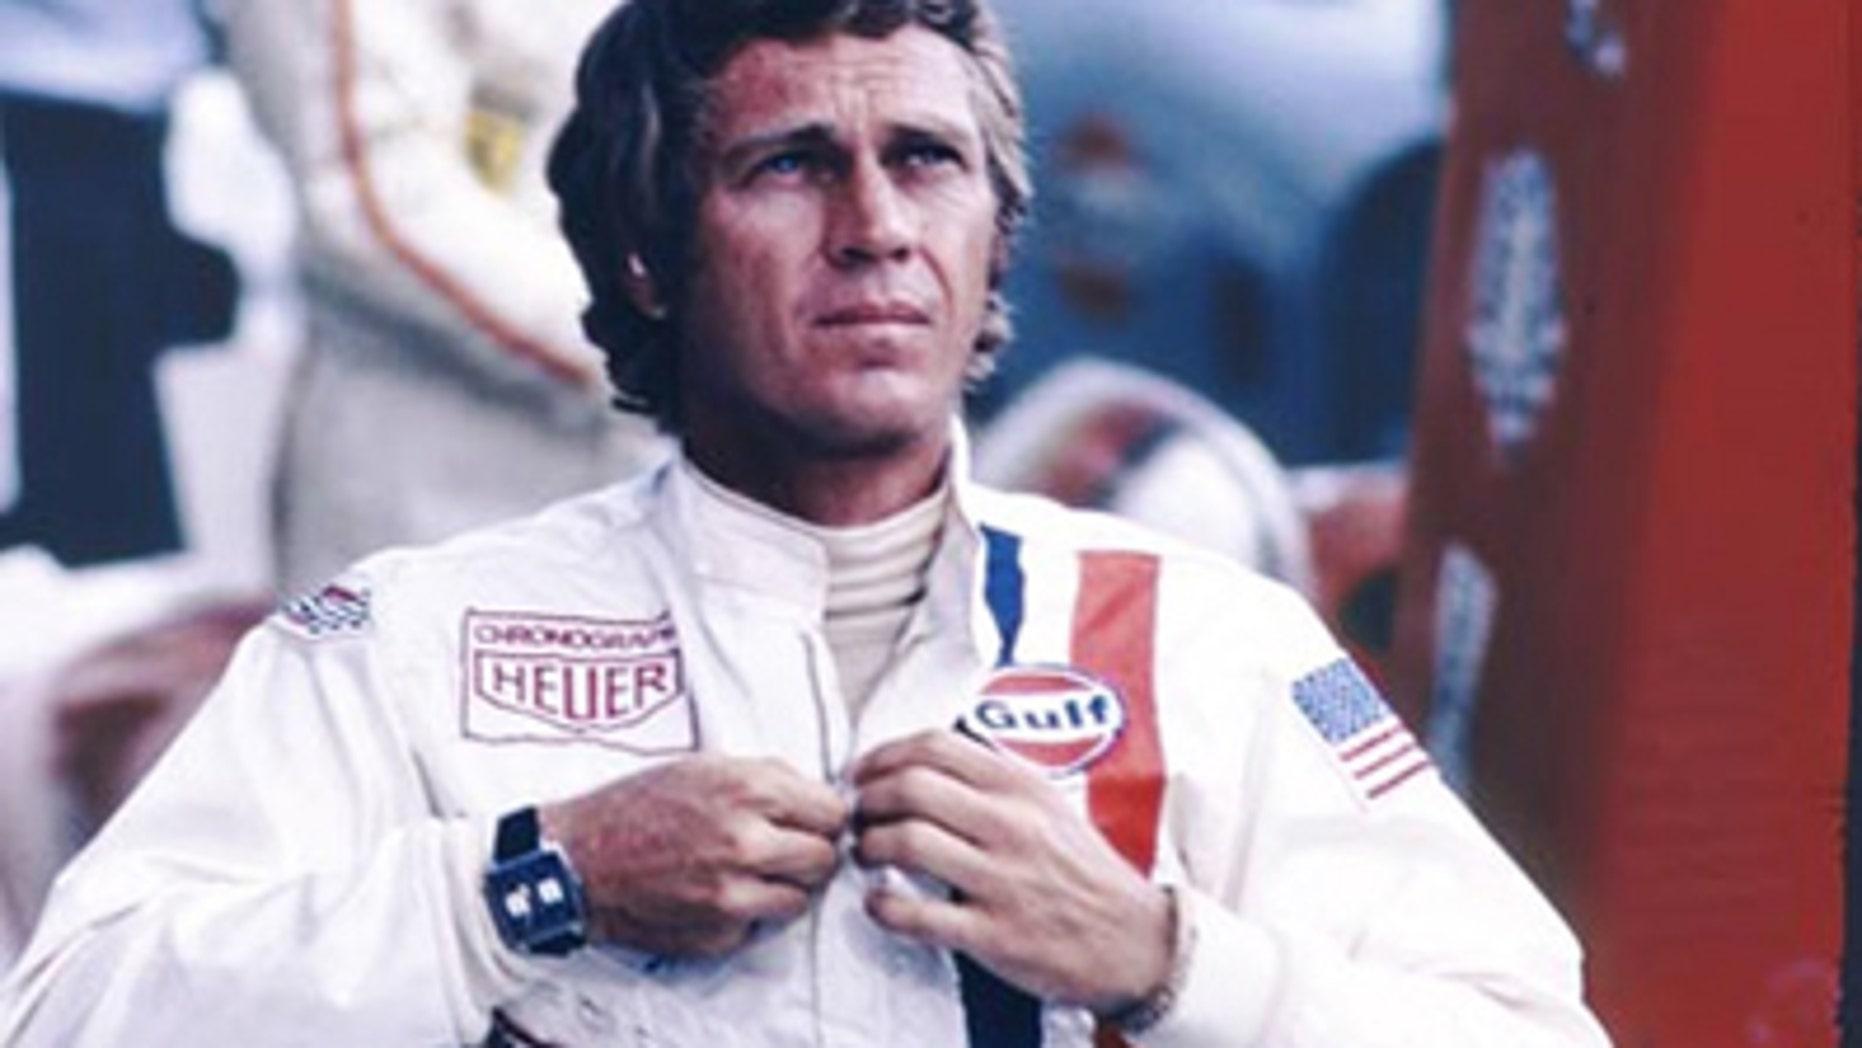 Image of Steve McQueen in Le Mans